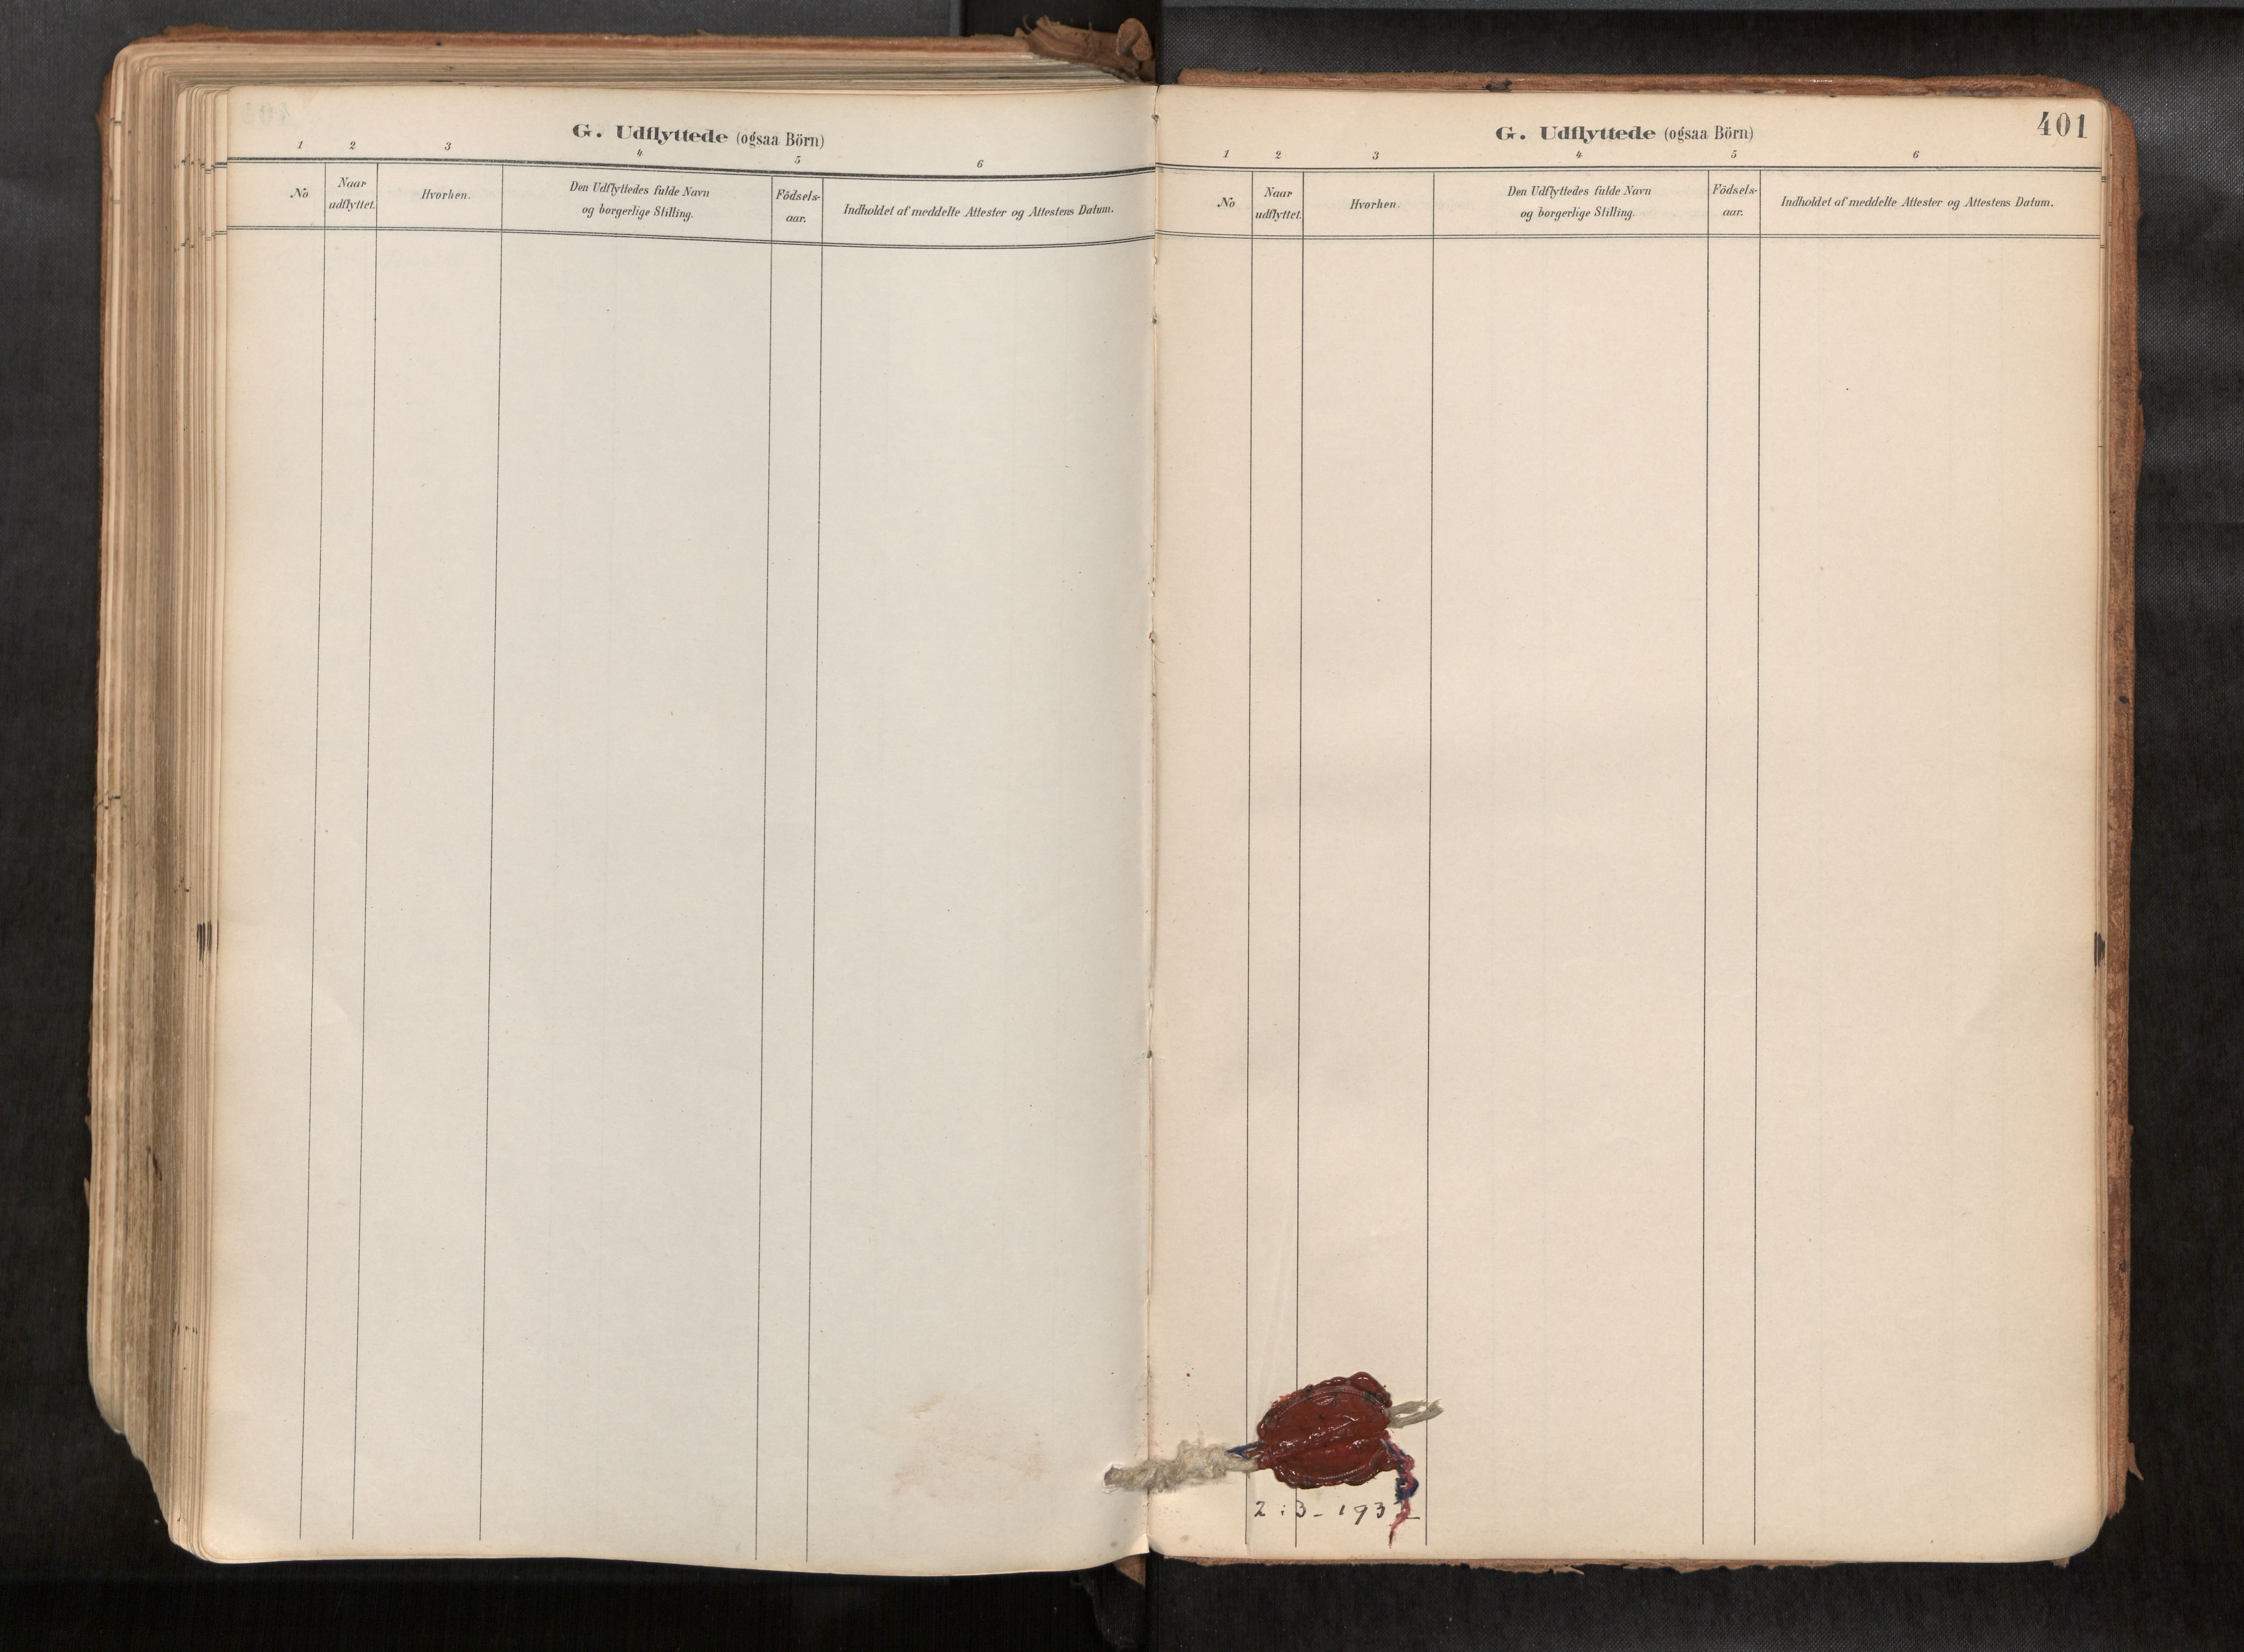 SAT, Ministerialprotokoller, klokkerbøker og fødselsregistre - Sør-Trøndelag, 692/L1105b: Parish register (official) no. 692A06, 1891-1934, p. 401